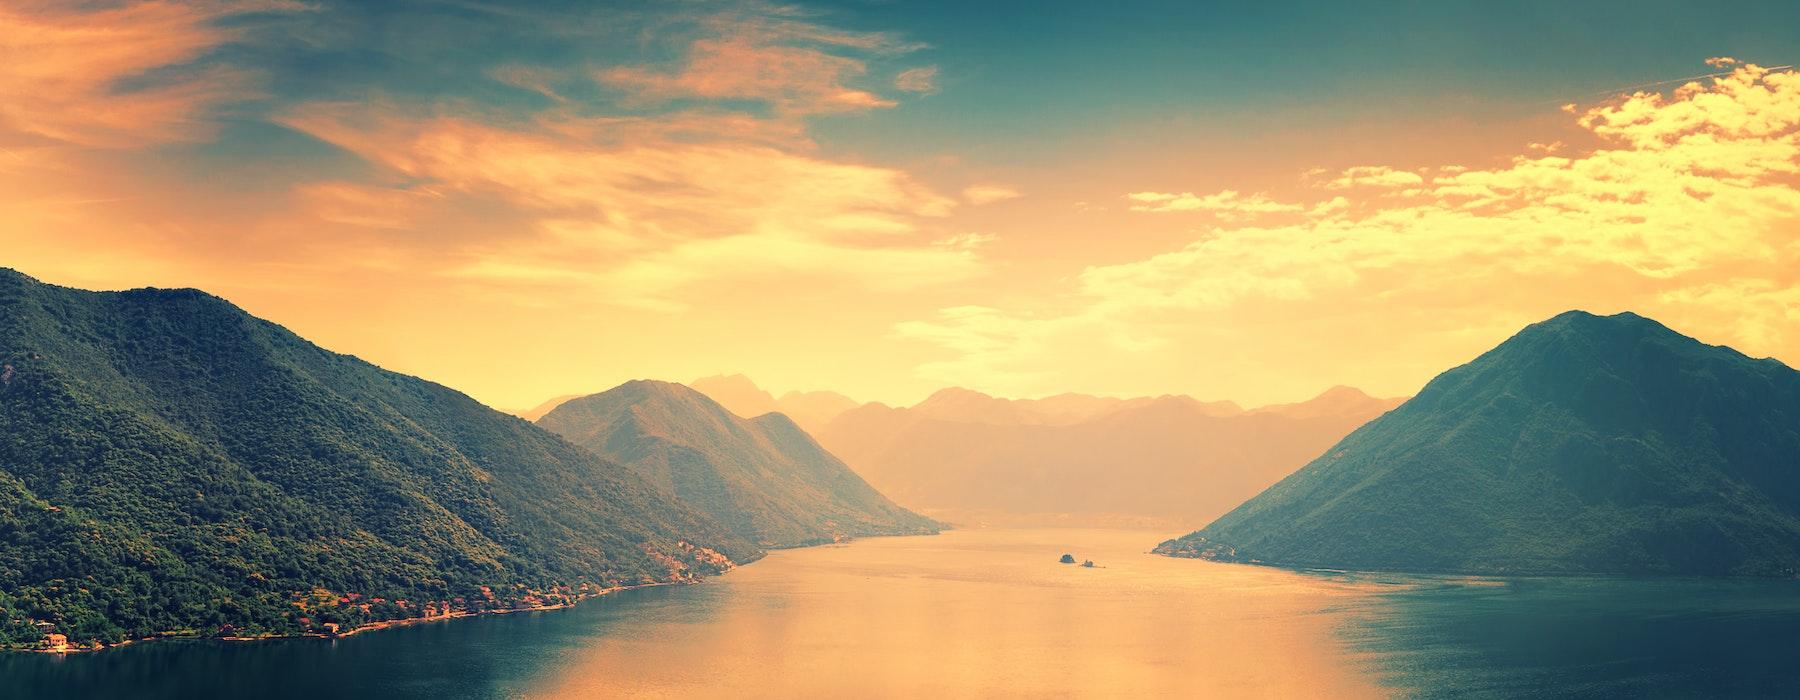 Montenegro Yacht Charter Destination